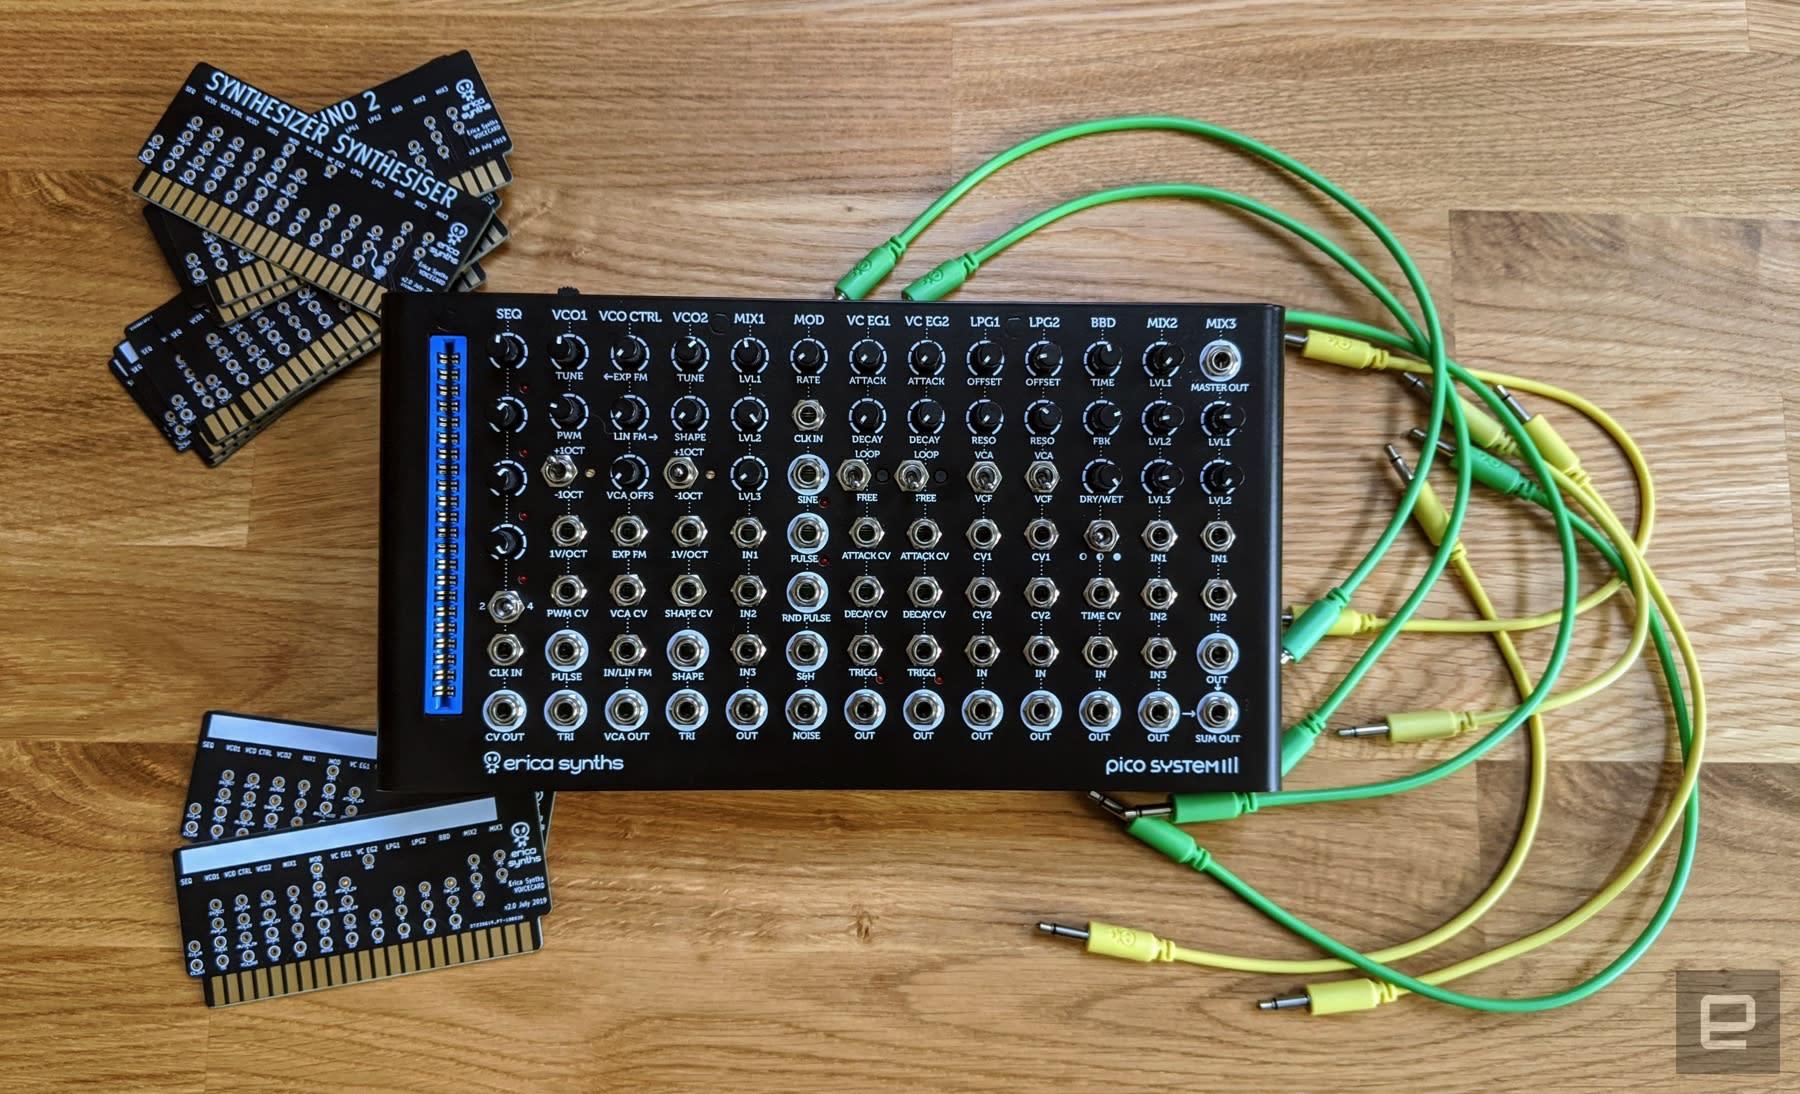 Erica Synths' Pico System III desktop modular west coast synthesizer